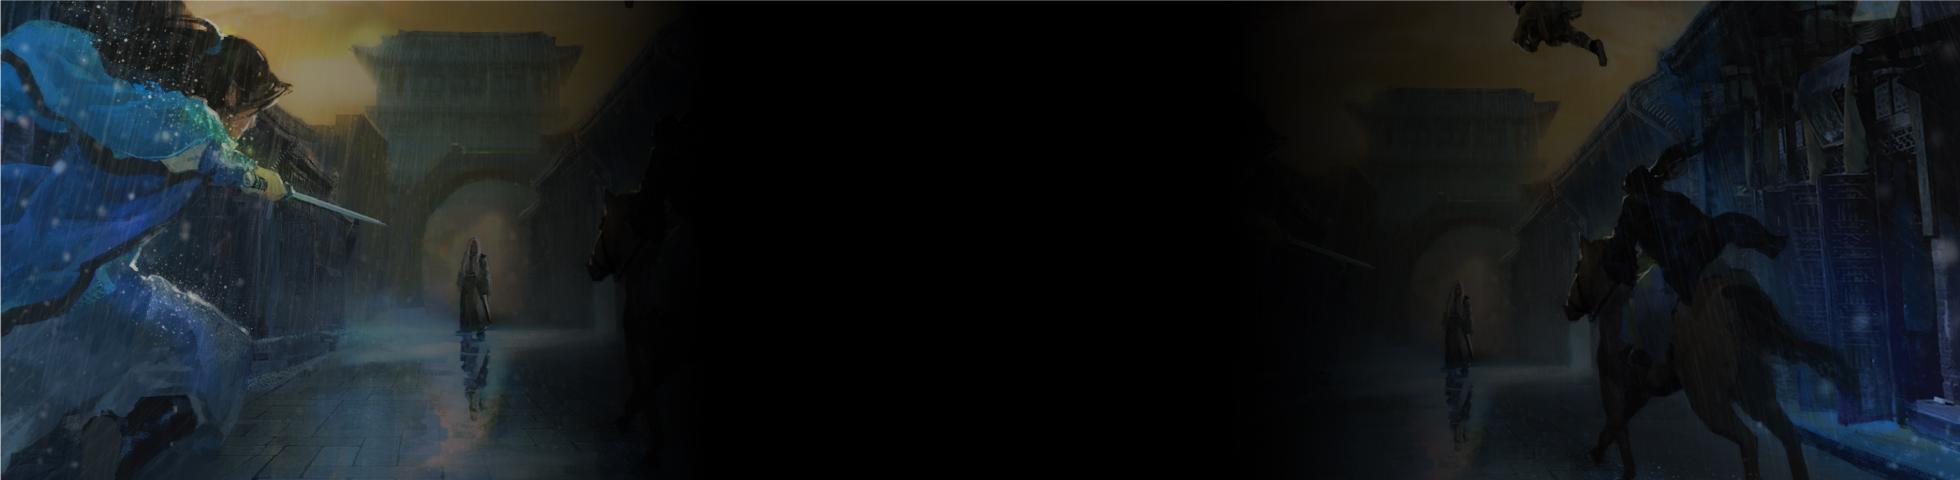 herobanner-ท้าลิขิตพลิกโชคชะตา 8-bg